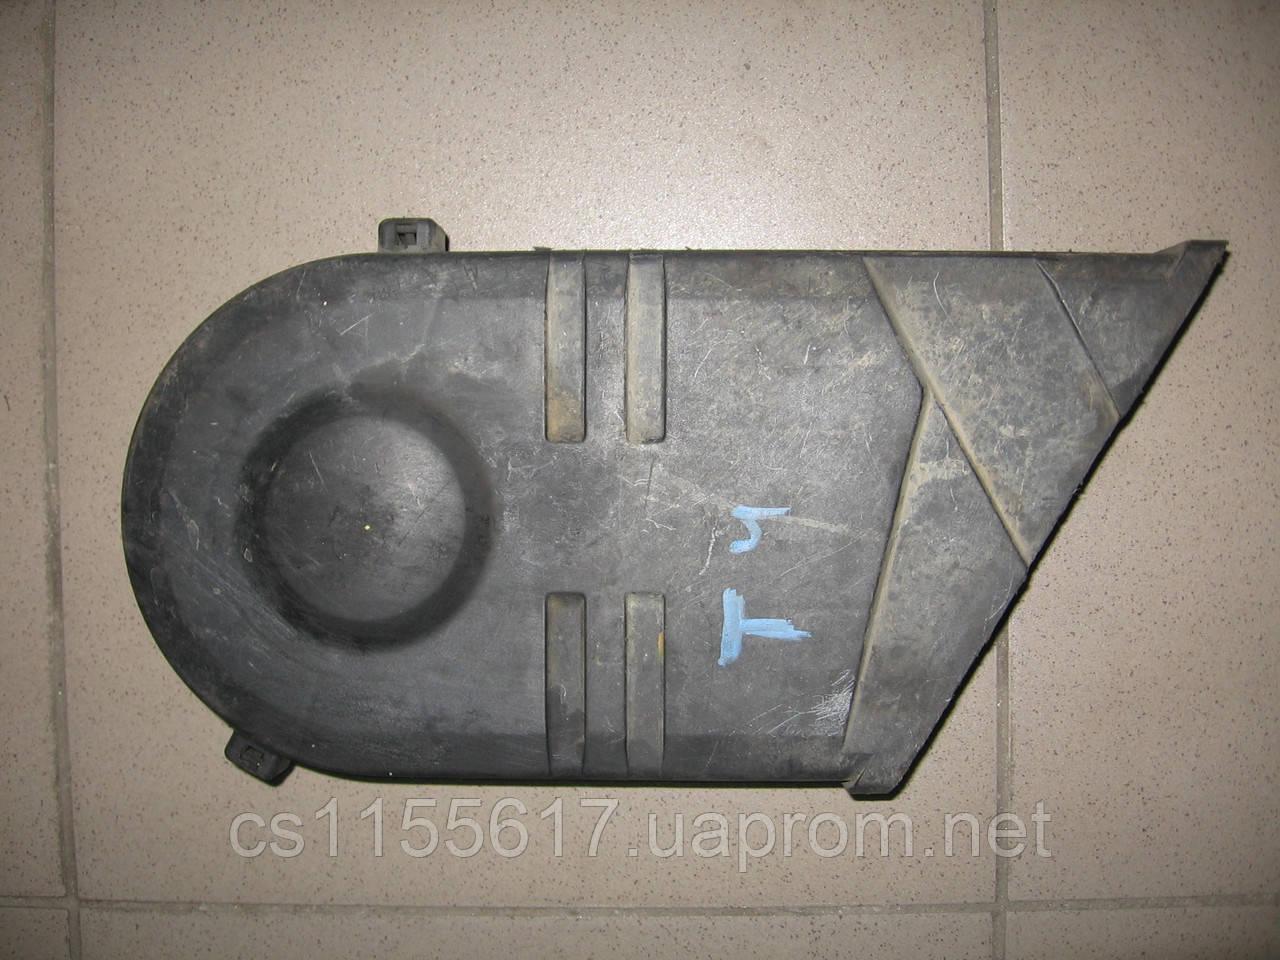 Защита/крышка ремня ГРМ 074109123A б/у на VW T4 2.5tdi год 1990-2003